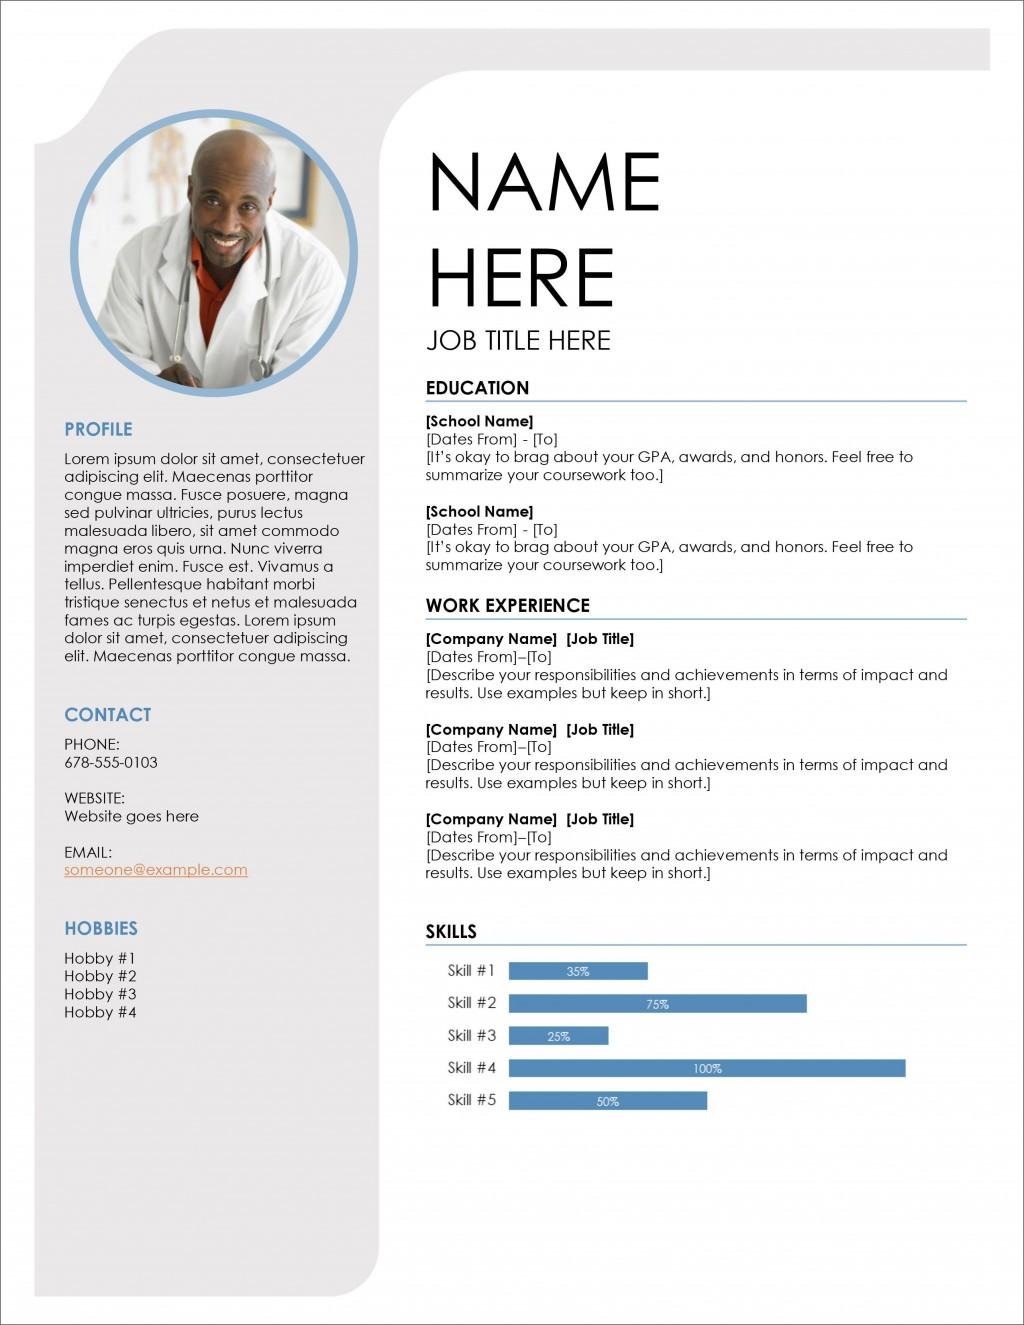 008 Surprising Free Basic Resume Template Download Image  M Word Quora For Microsoft 2010Large